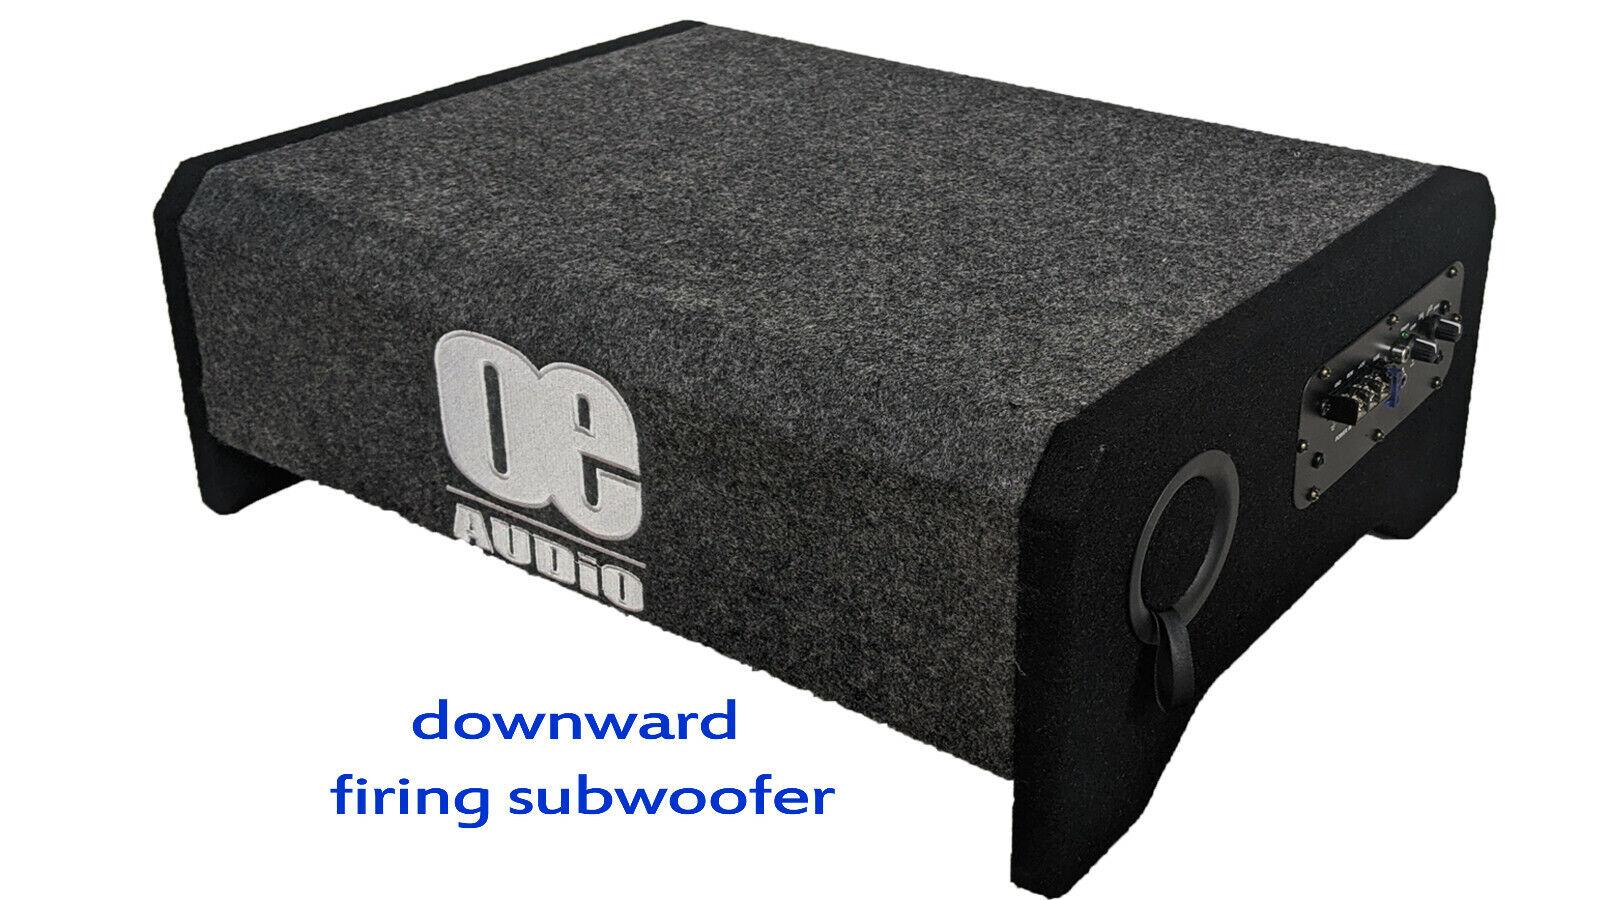 OE AUDIO OE-110FA 10 Inch 25cm 1300W Active Car Subwoofer Bass Box fire down